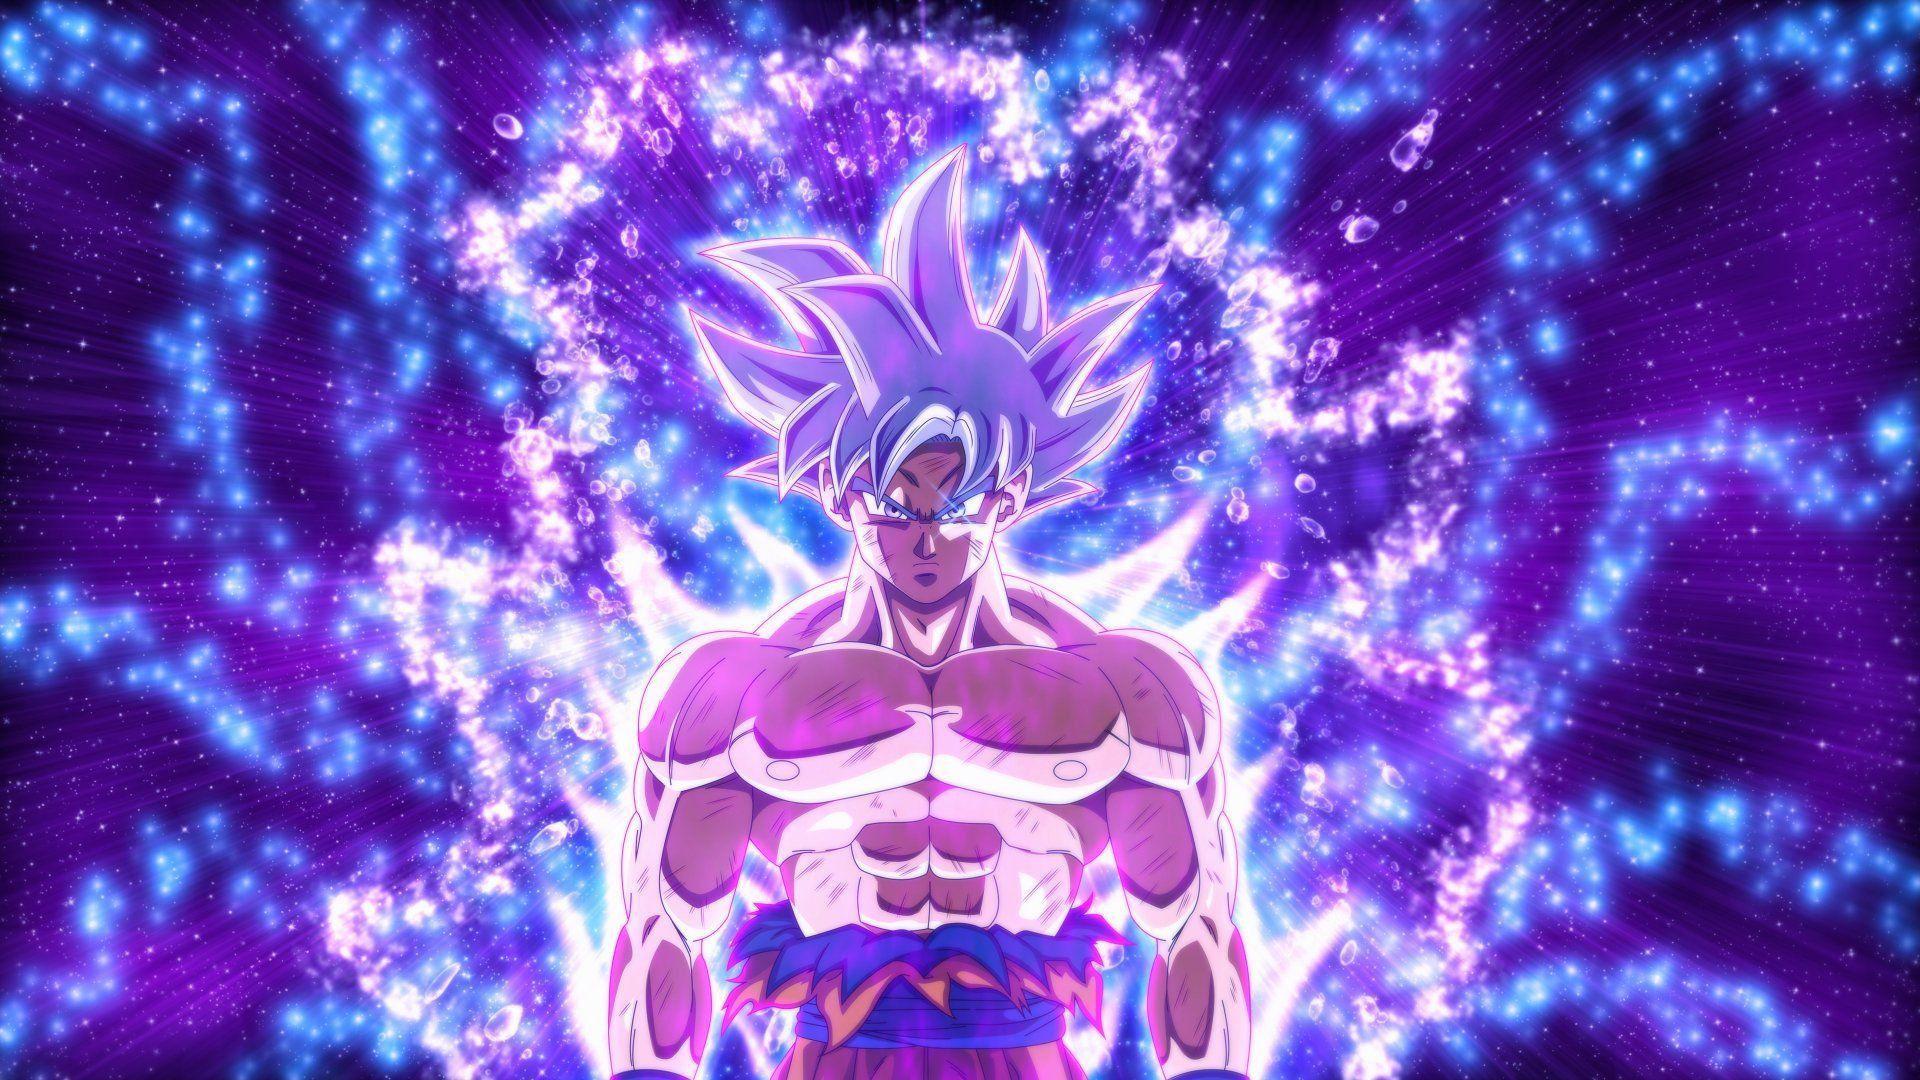 Awesome Goku Wallpapers Top Free Awesome Goku Backgrounds